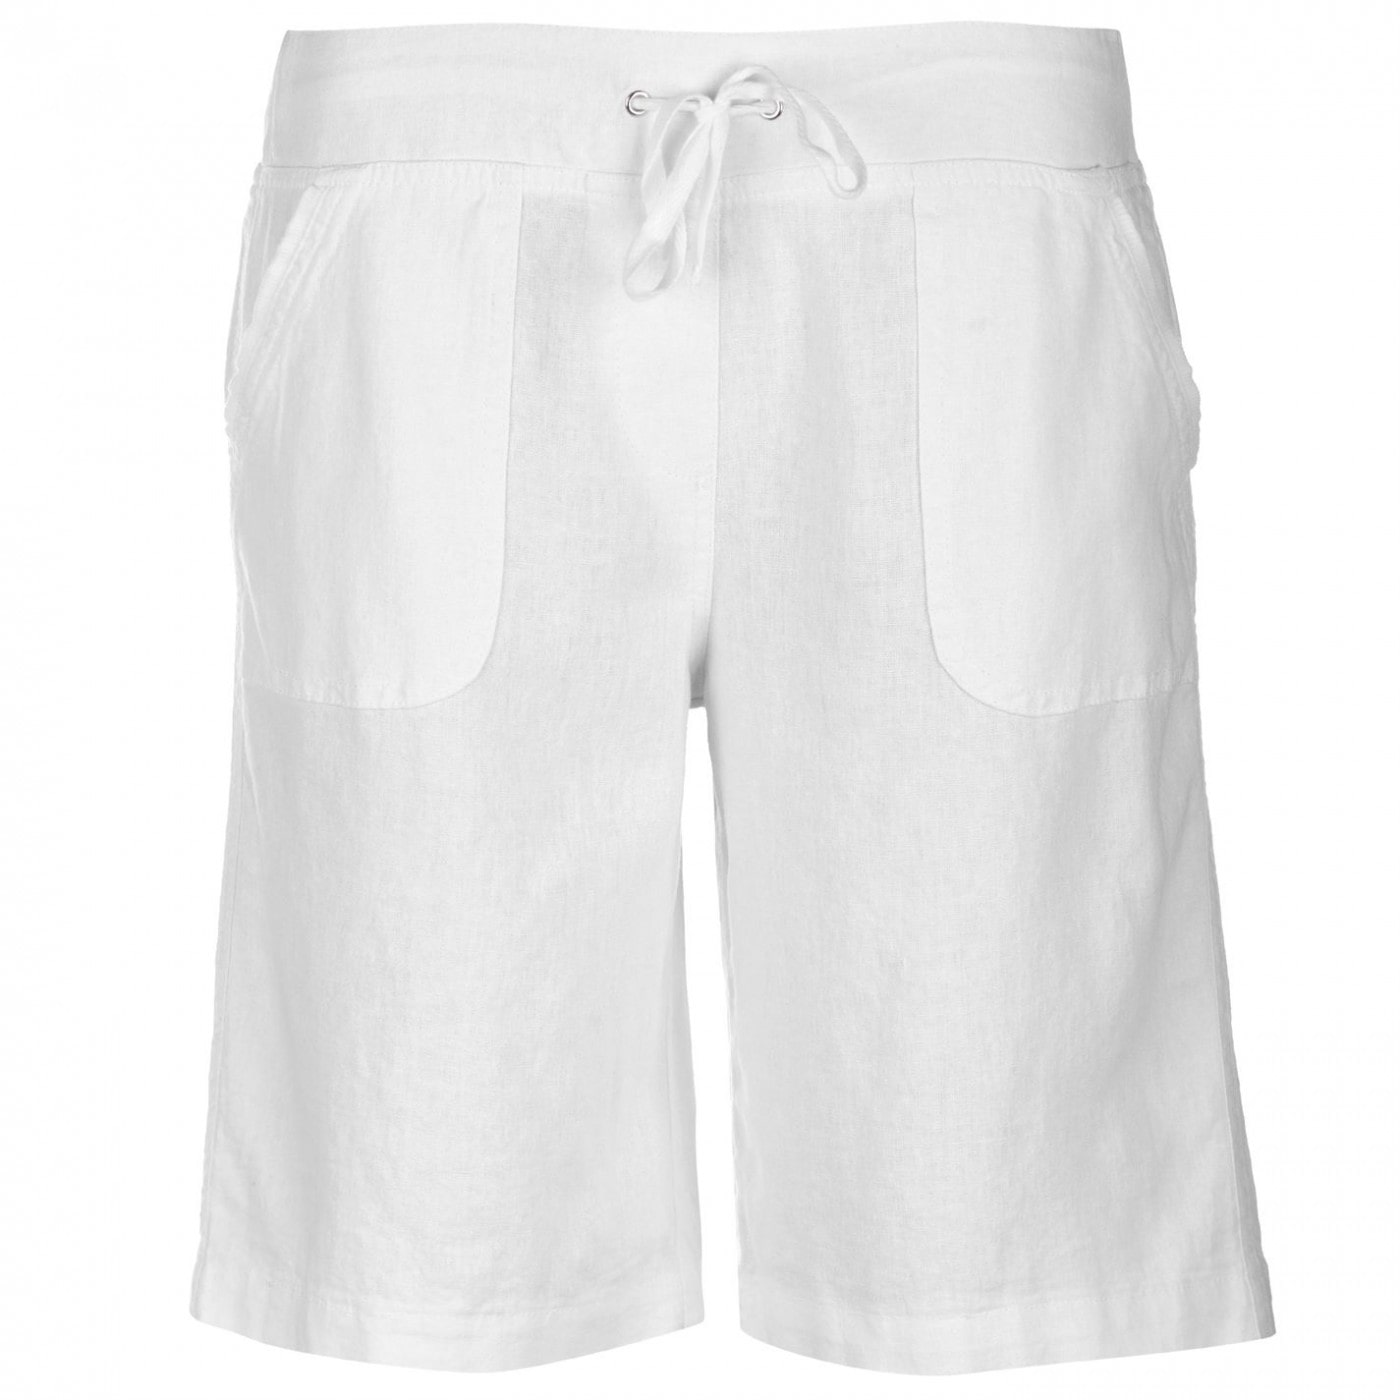 Full Circle Linen Shorts Ladies